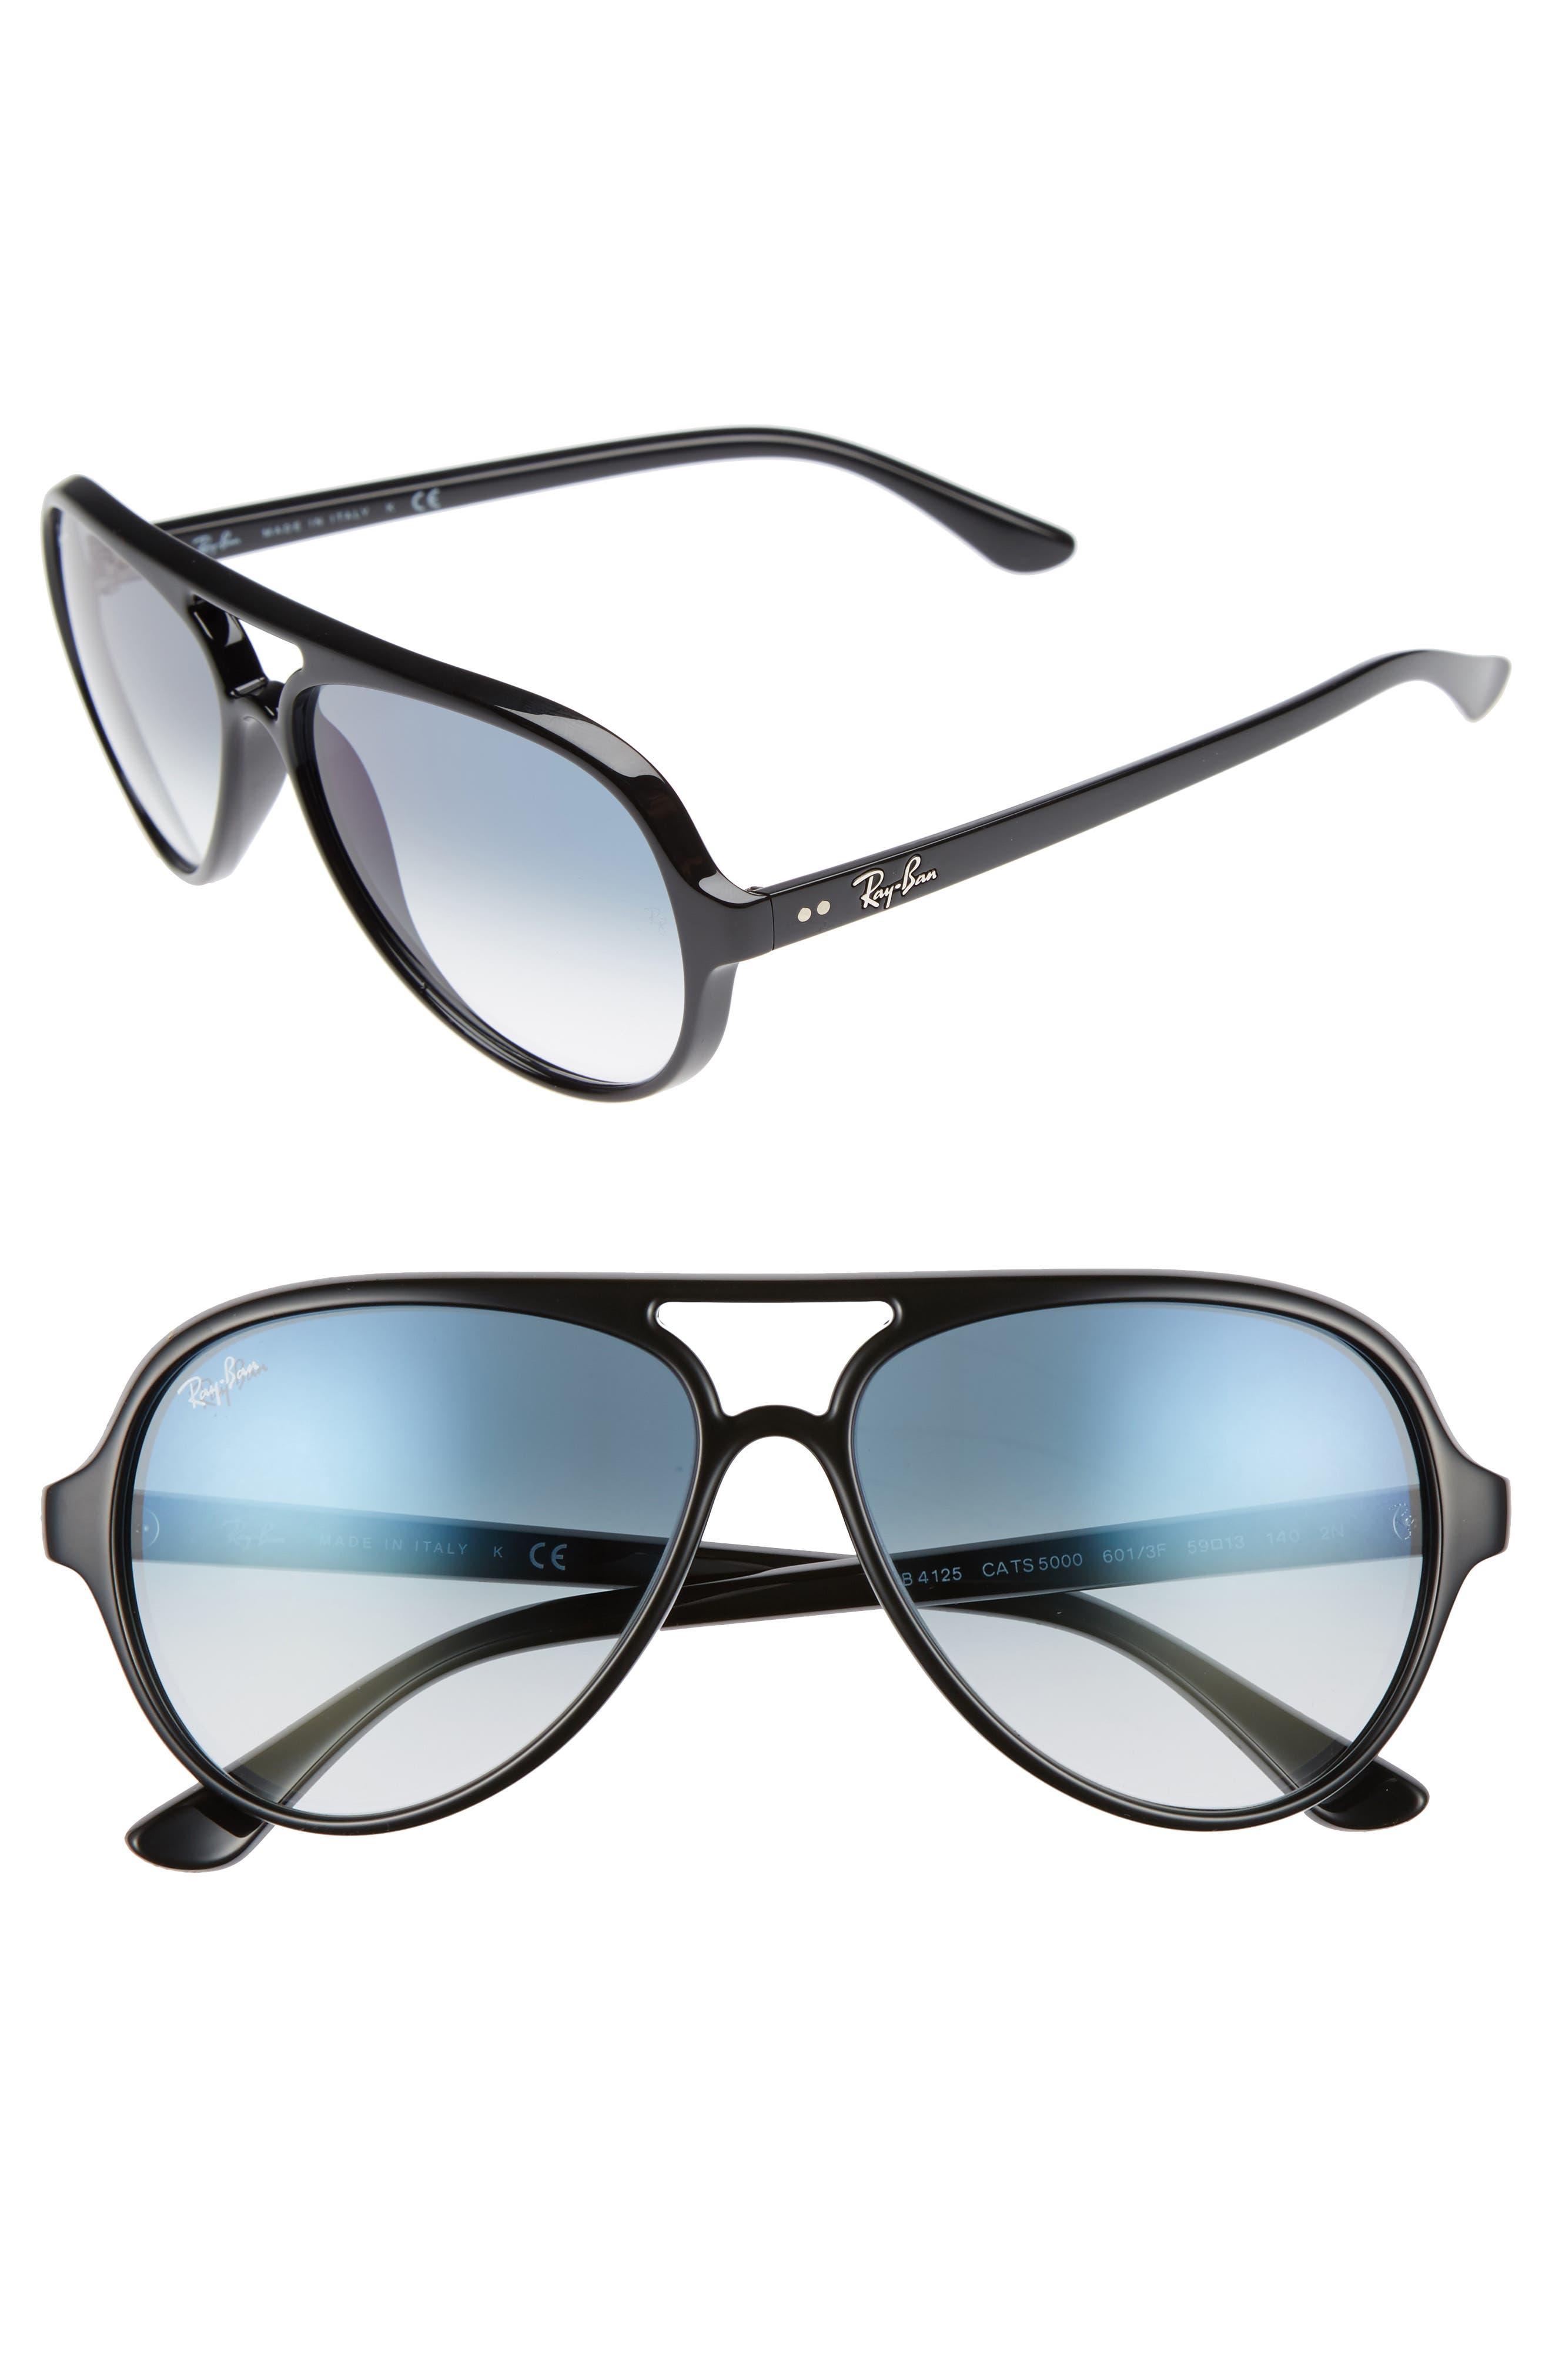 59mm Resin Aviator Sunglasses,                         Main,                         color, Black/ Azure Shadow